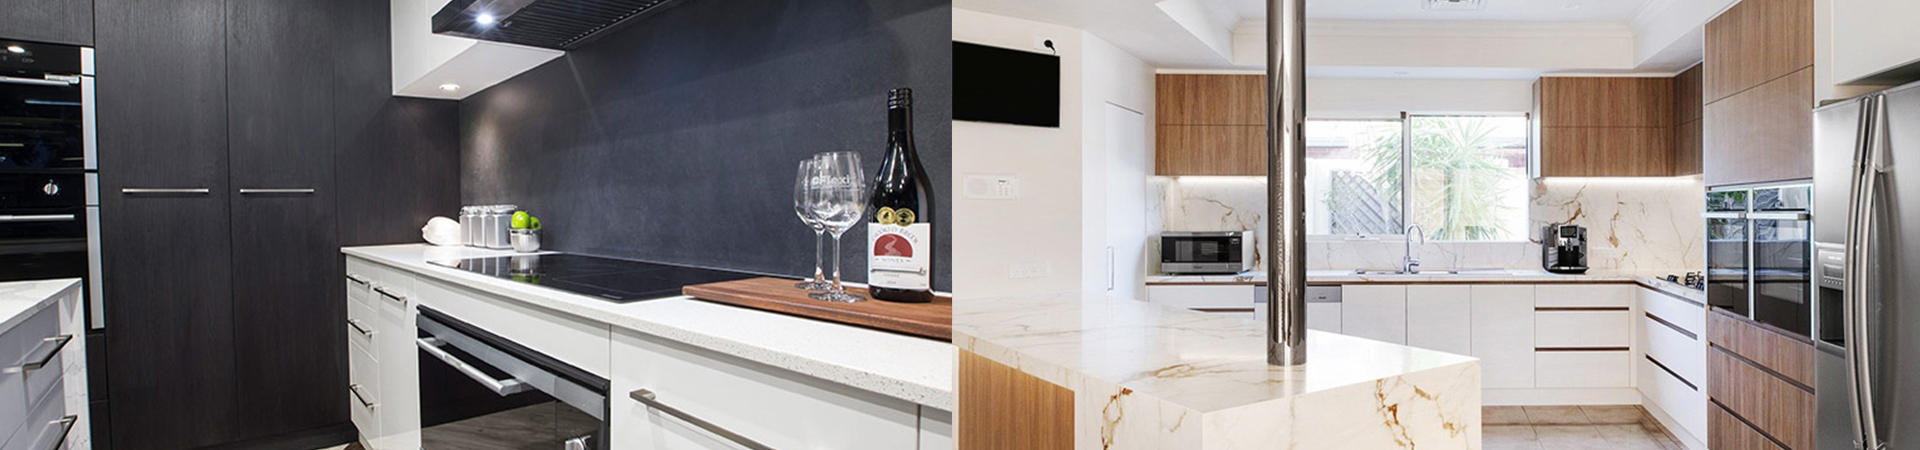 Flexi Kitchen Renovations